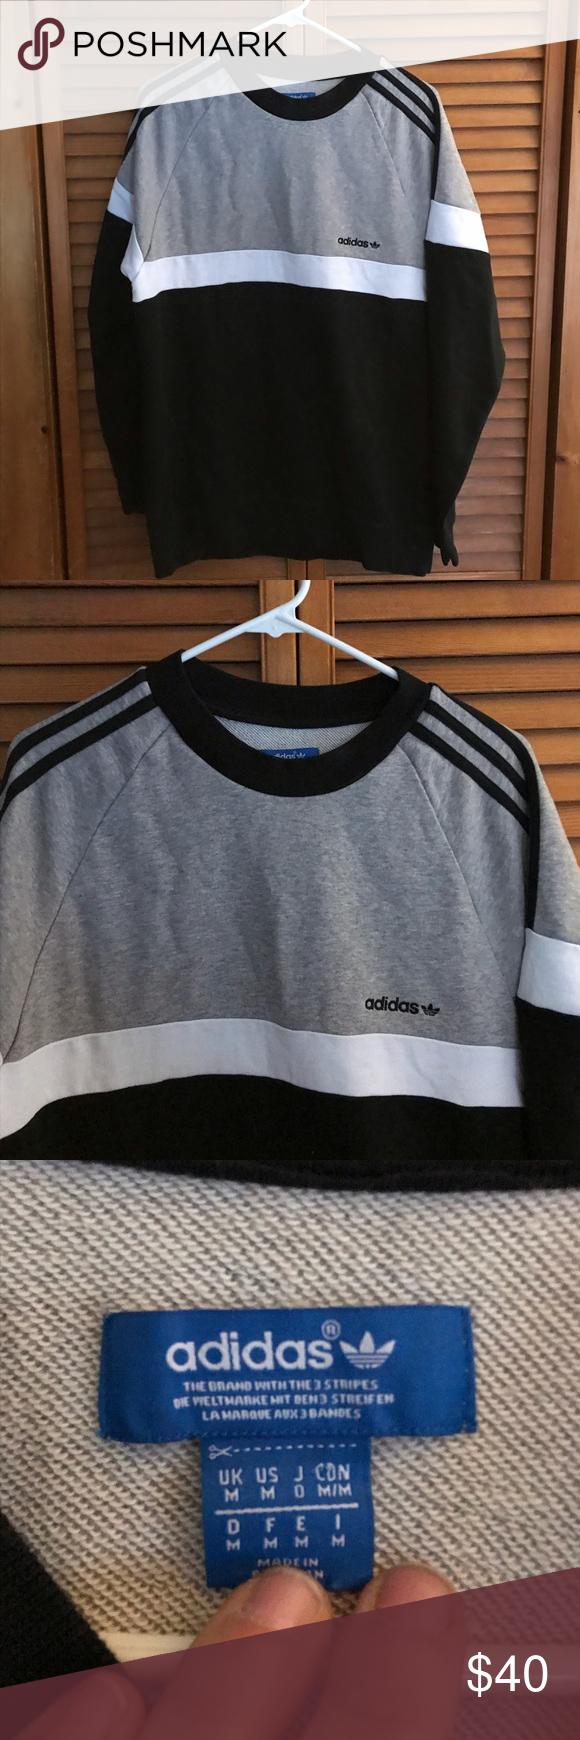 Predownload: Adidas Crewneck Sweatshirt Crew Neck Sweatshirt Sweatshirts Adidas Shirt [ 1740 x 580 Pixel ]